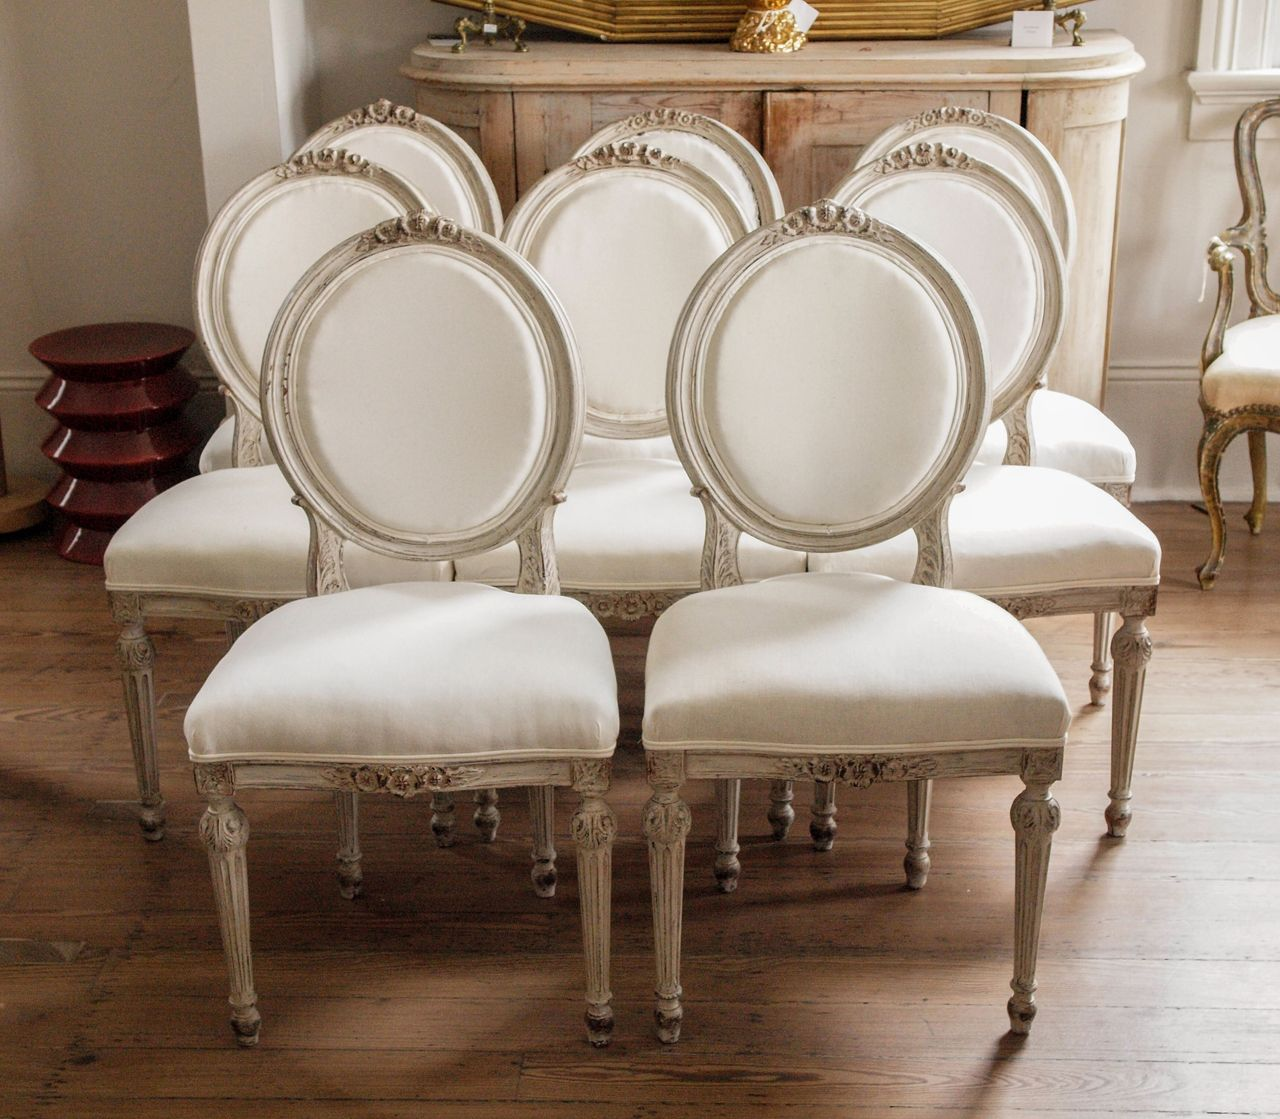 gustavian furniture | Swedish Gustavian Dining Chairs at 1stdibs